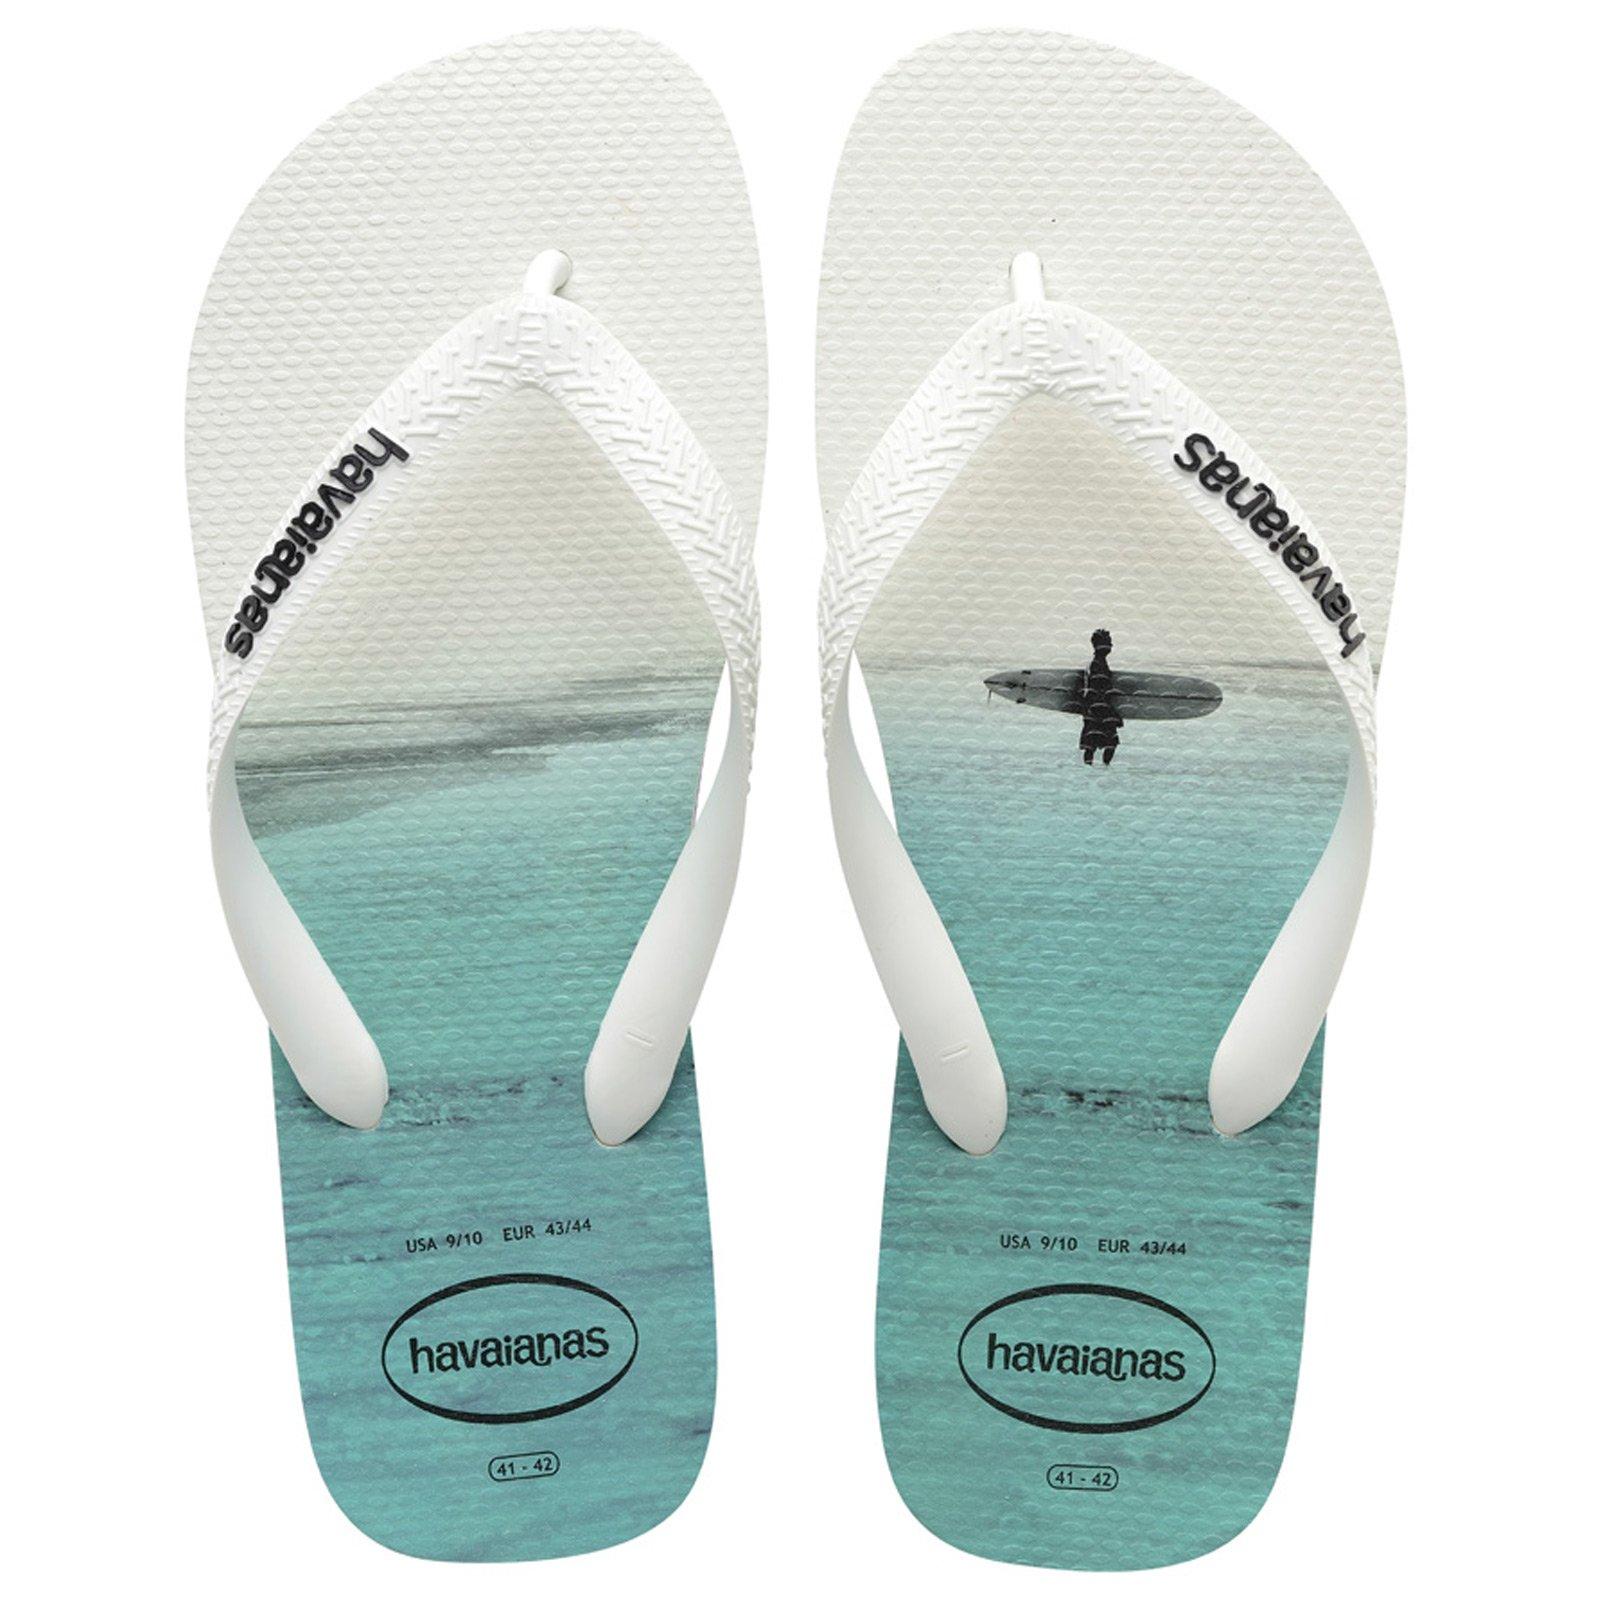 ff8d222b972a8c Flip-Flops Hype White-black - Brand Havaianas